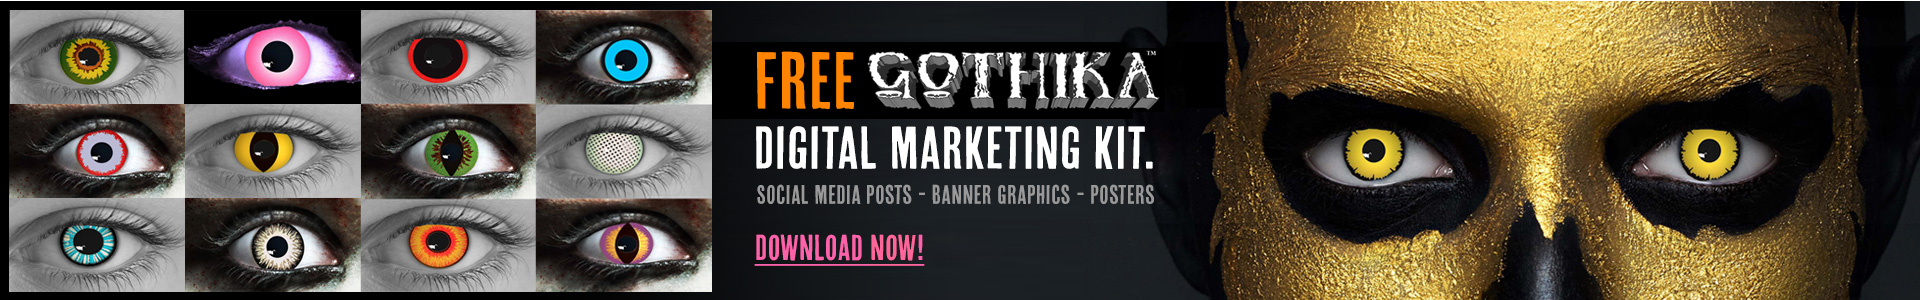 Wva gothika desktop banner